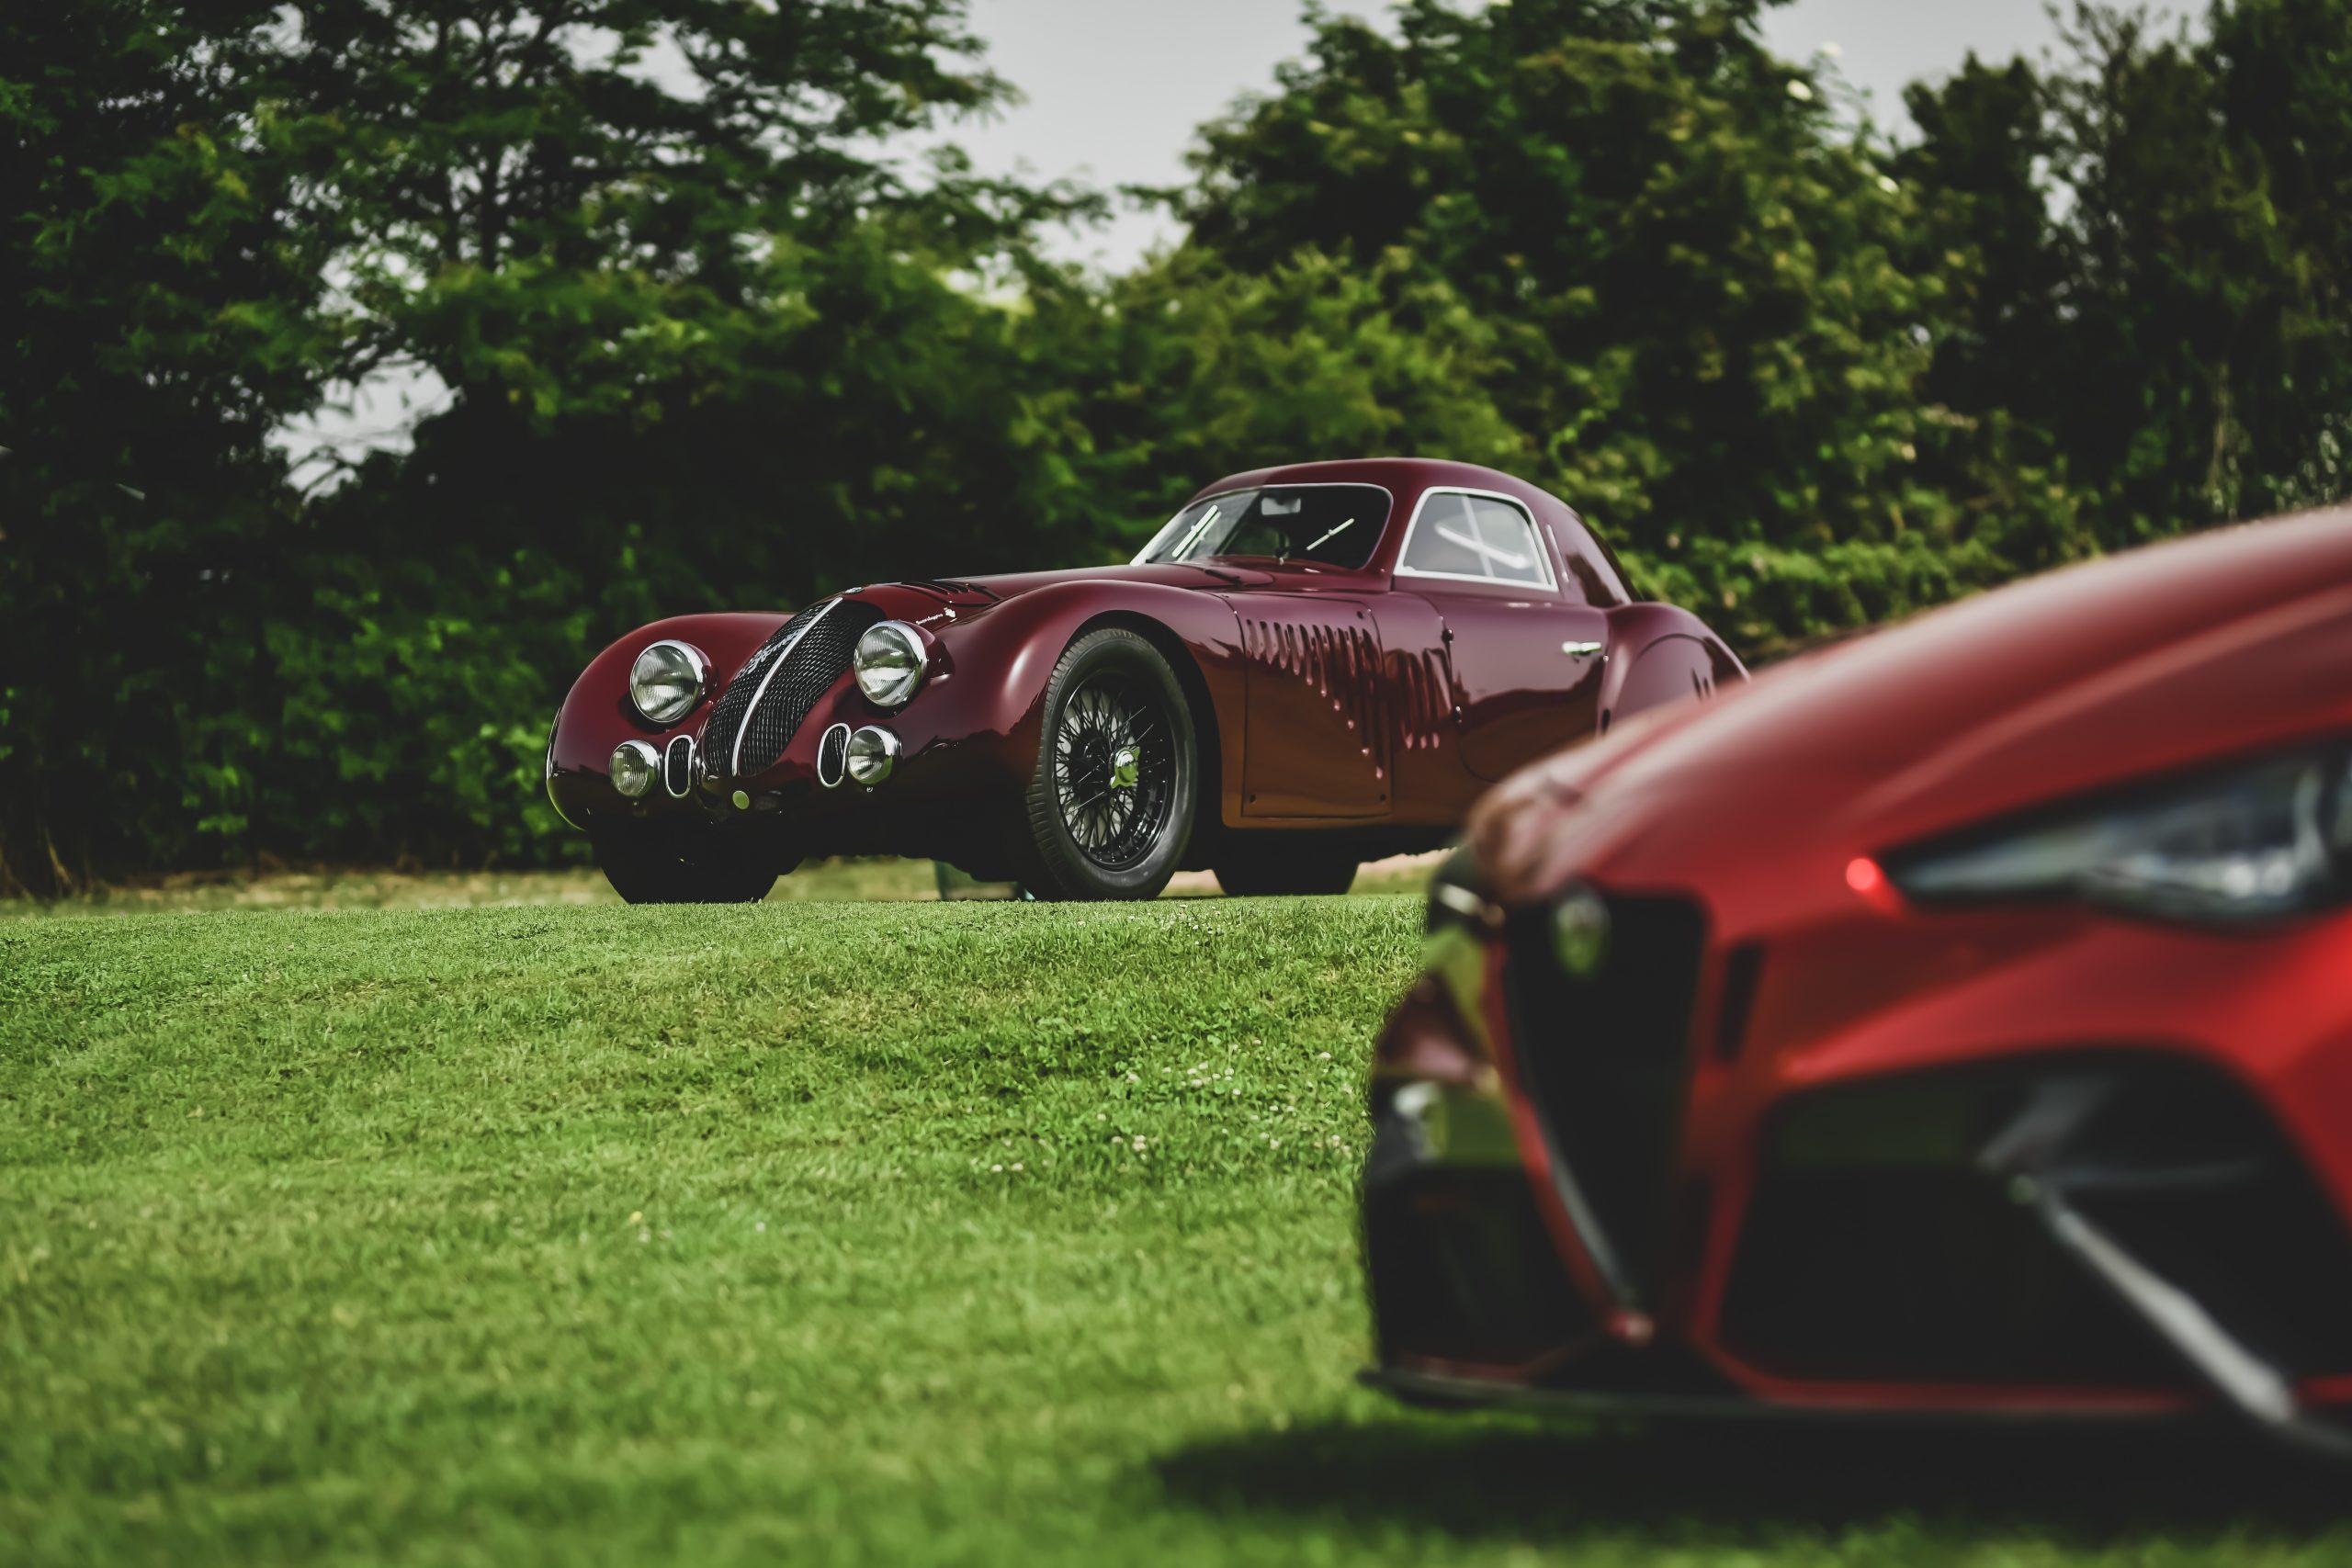 05 Alfa Romeo at REB Concours 2021 scaled Alfa Romeo, Παρελθόν και Παρόν, πάντα σε κόκκινο χρώμα Alfa, alfa romeo, REB Concours, ειδήσεις, Νέα